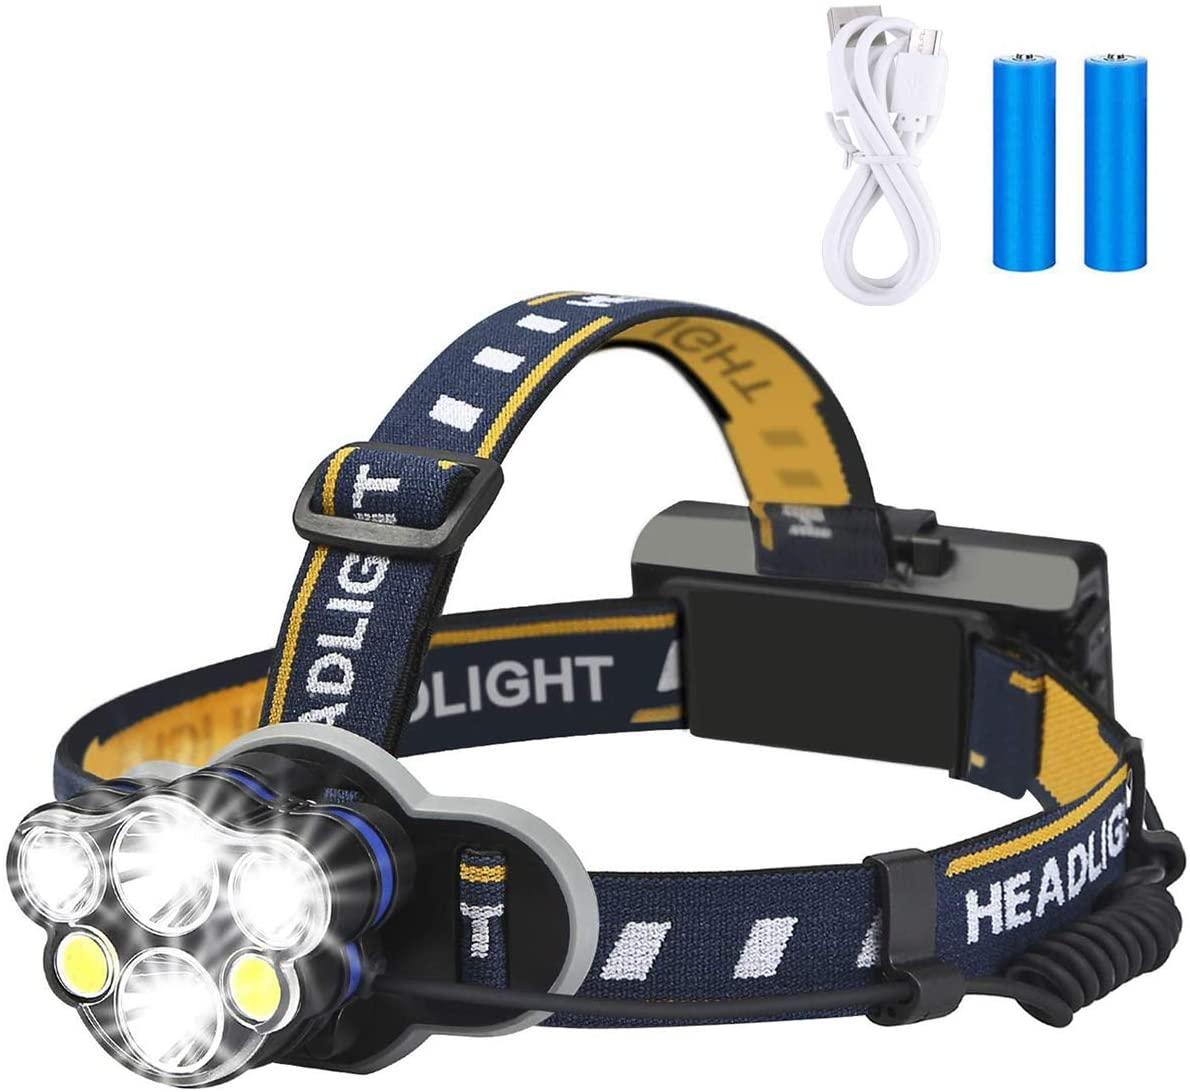 Rechargeable Headlamp, Waterproof LED Head Torch Rechargeable Headlamp Flashlight for Camping, Fishing, Cellar, Outdoors